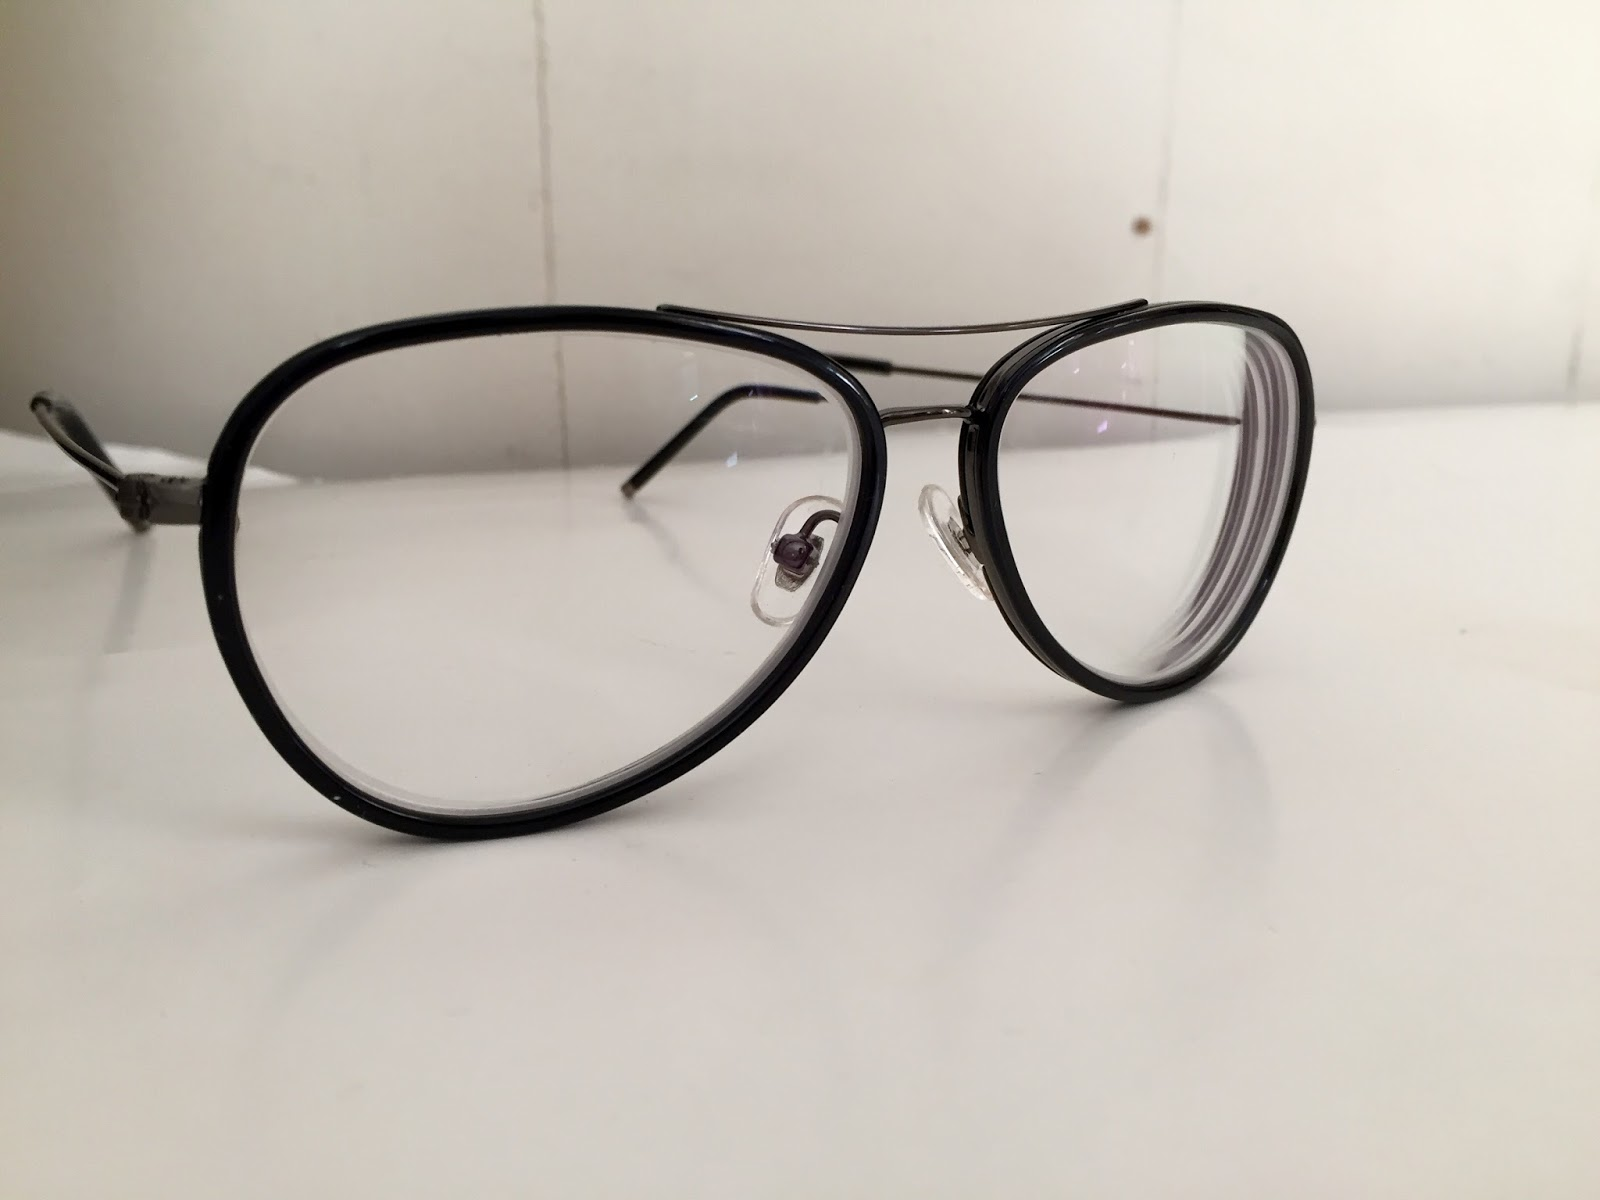 eating fabulously christopher stewart glassesshopcom prescription glasses glassesshopcom